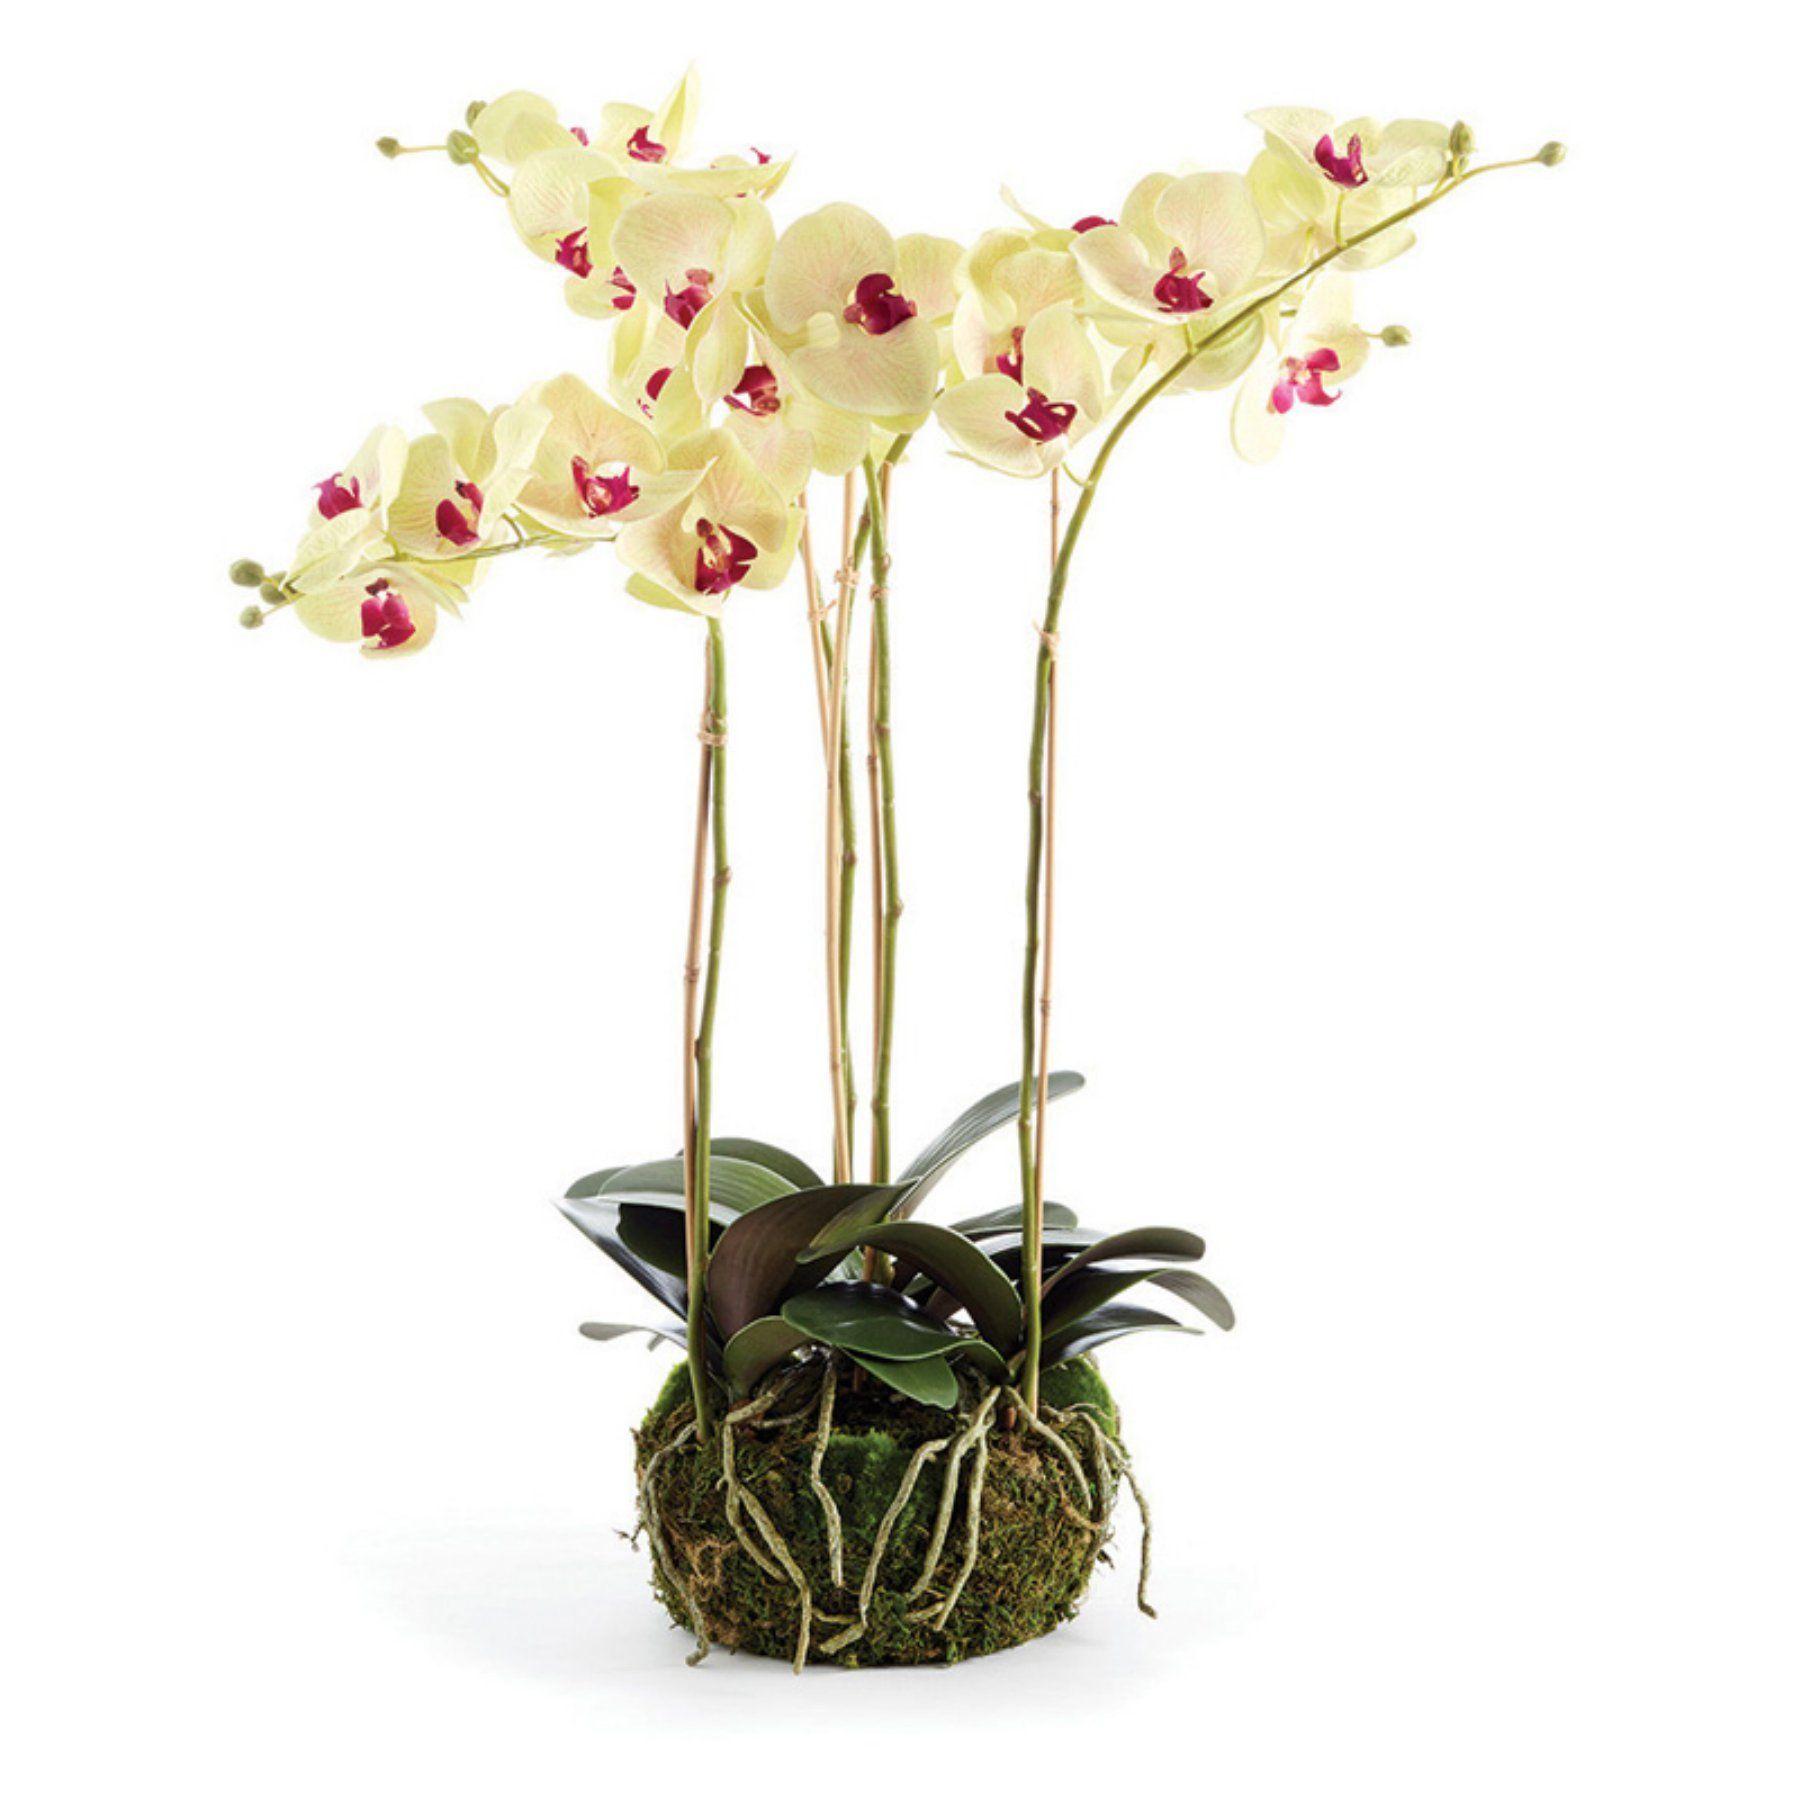 Napa Home and Garden Phalaenopsis 25 in. Bowl DropIn Silk